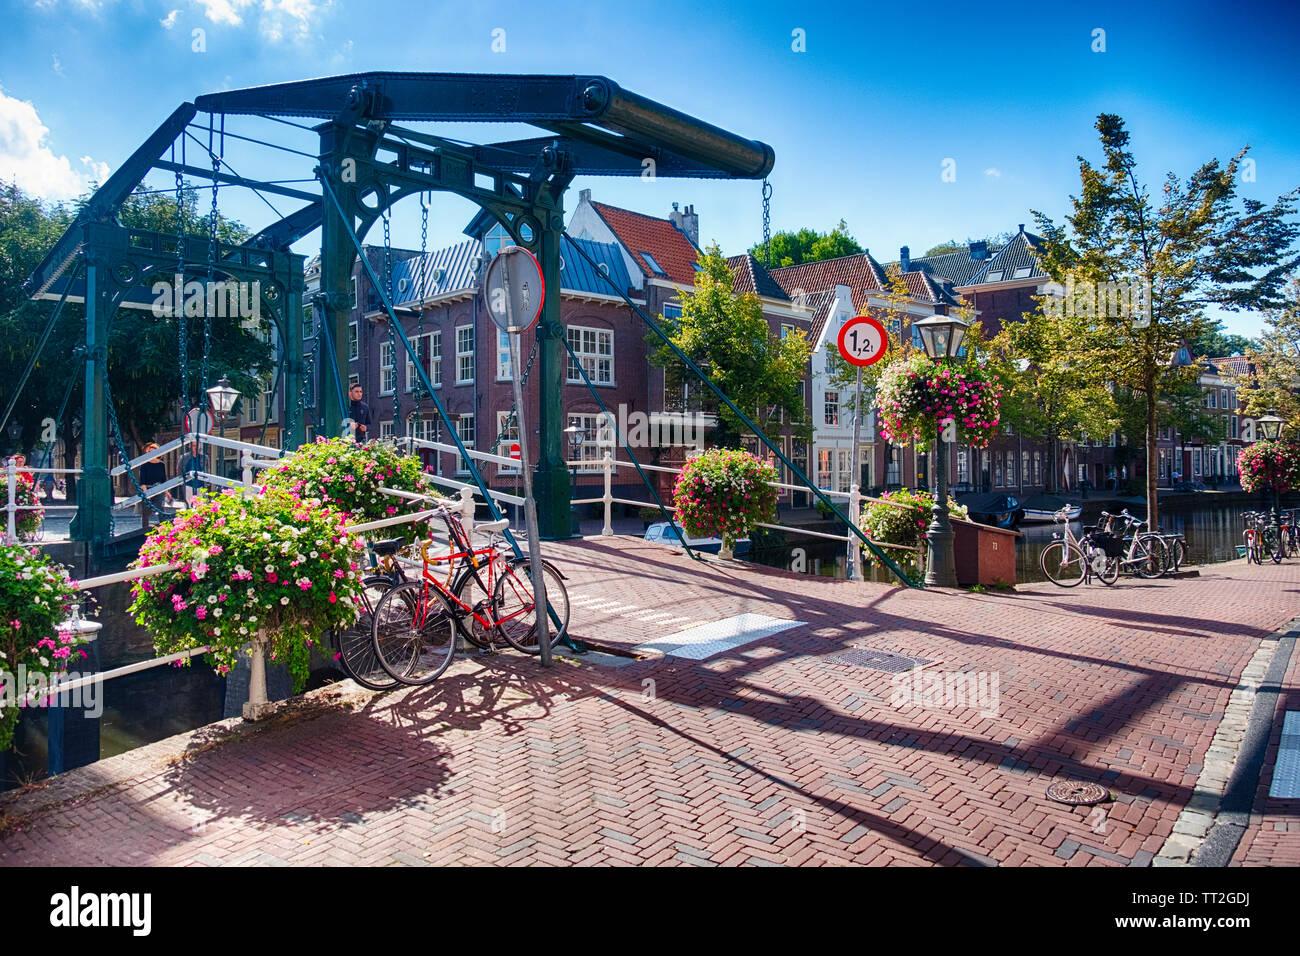 Drawbridge over a Canal, Leiden, Netherlands Stock Photo